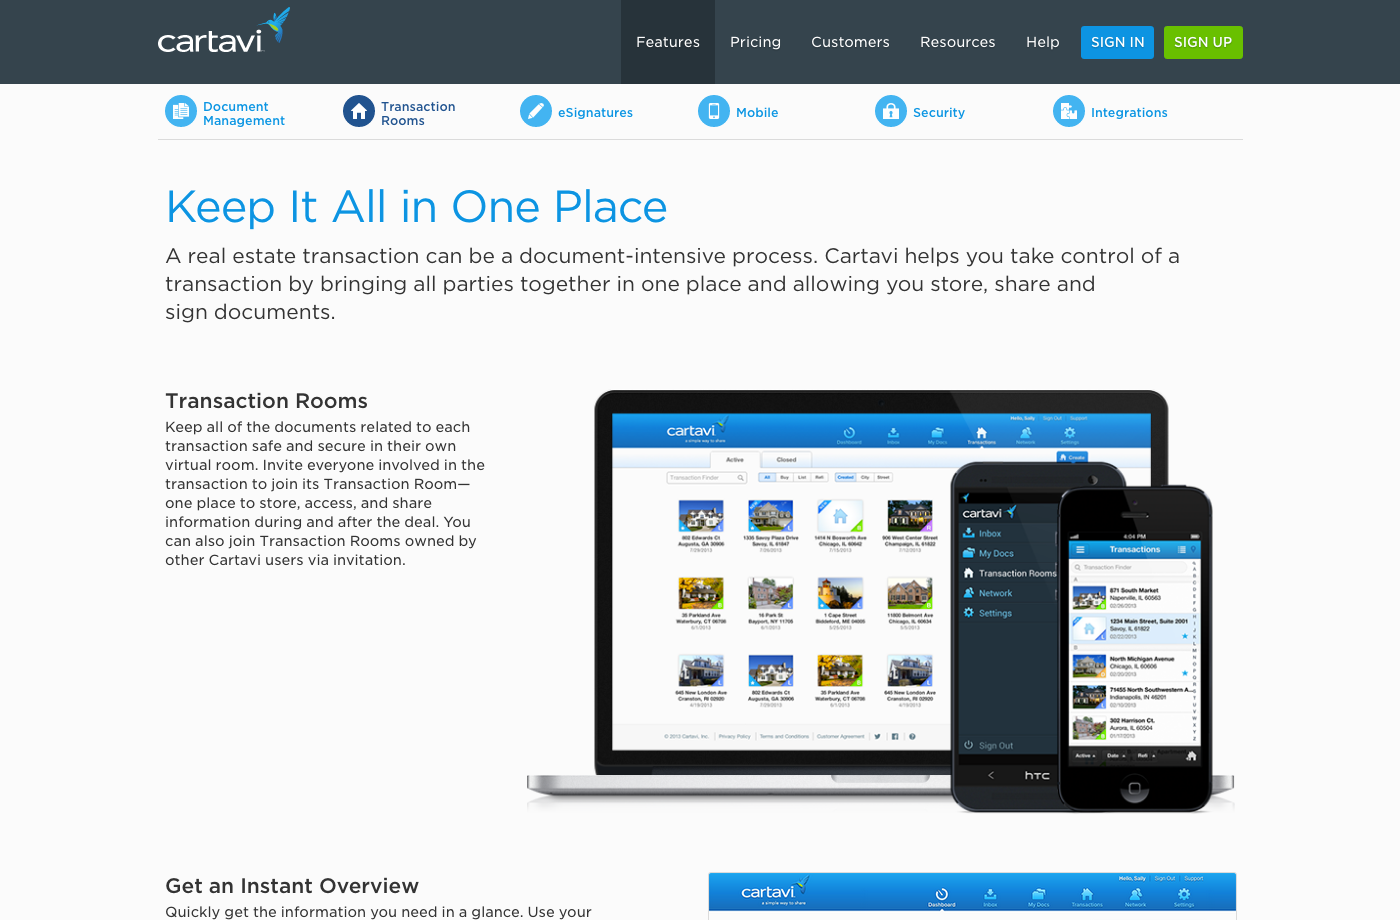 Cartavi - Branding, Website, and Product Design